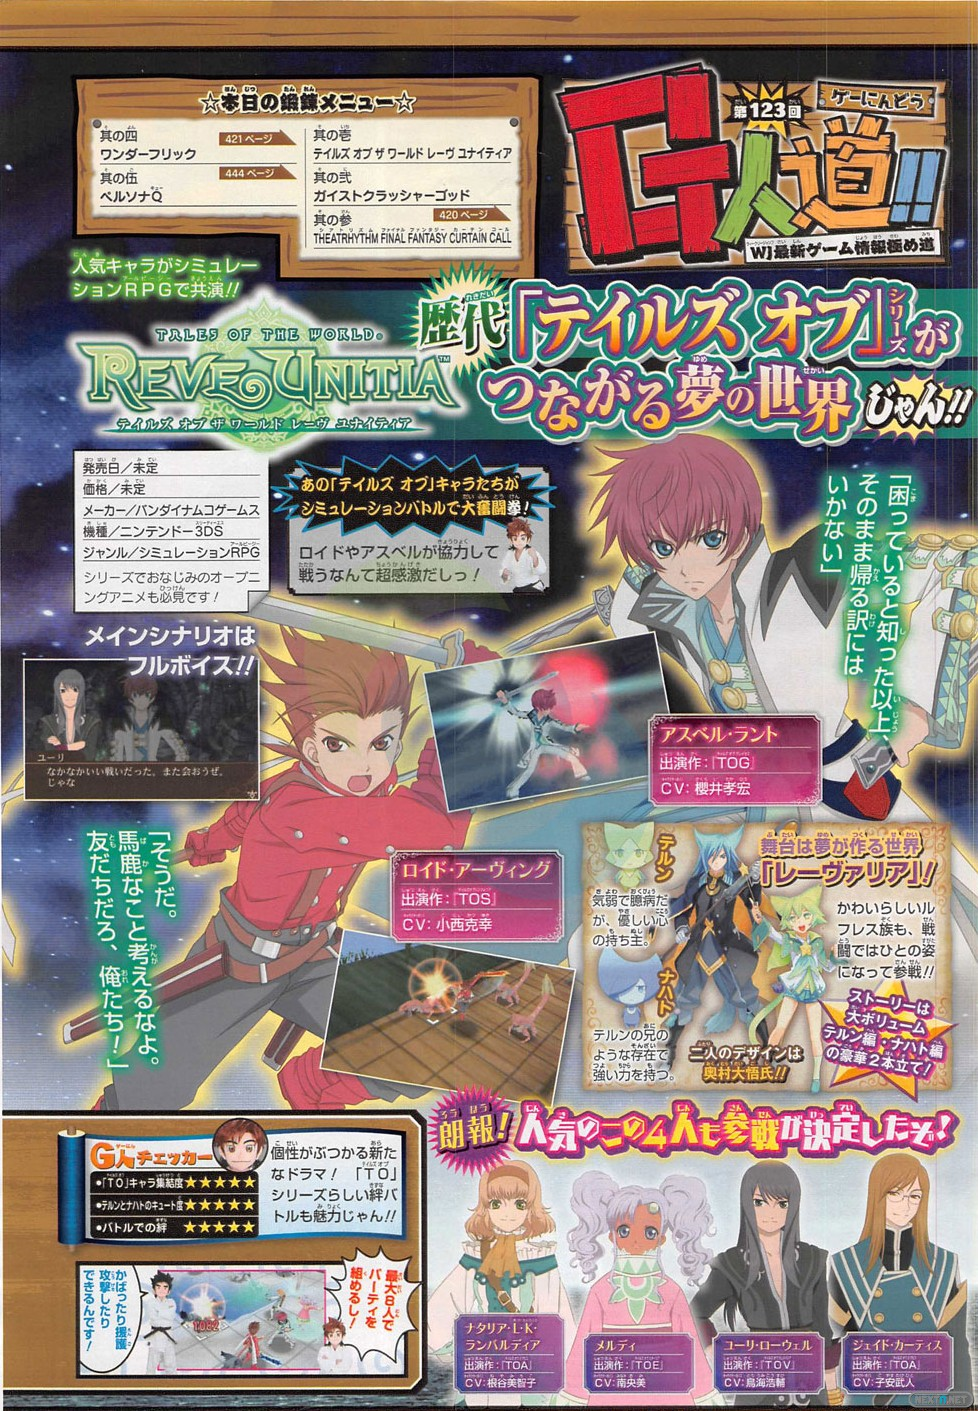 Tales of the World: Reve Unitia confirma su llegada a Nintendo 3DS Tales_of_the_world_reve_unitia-2499959